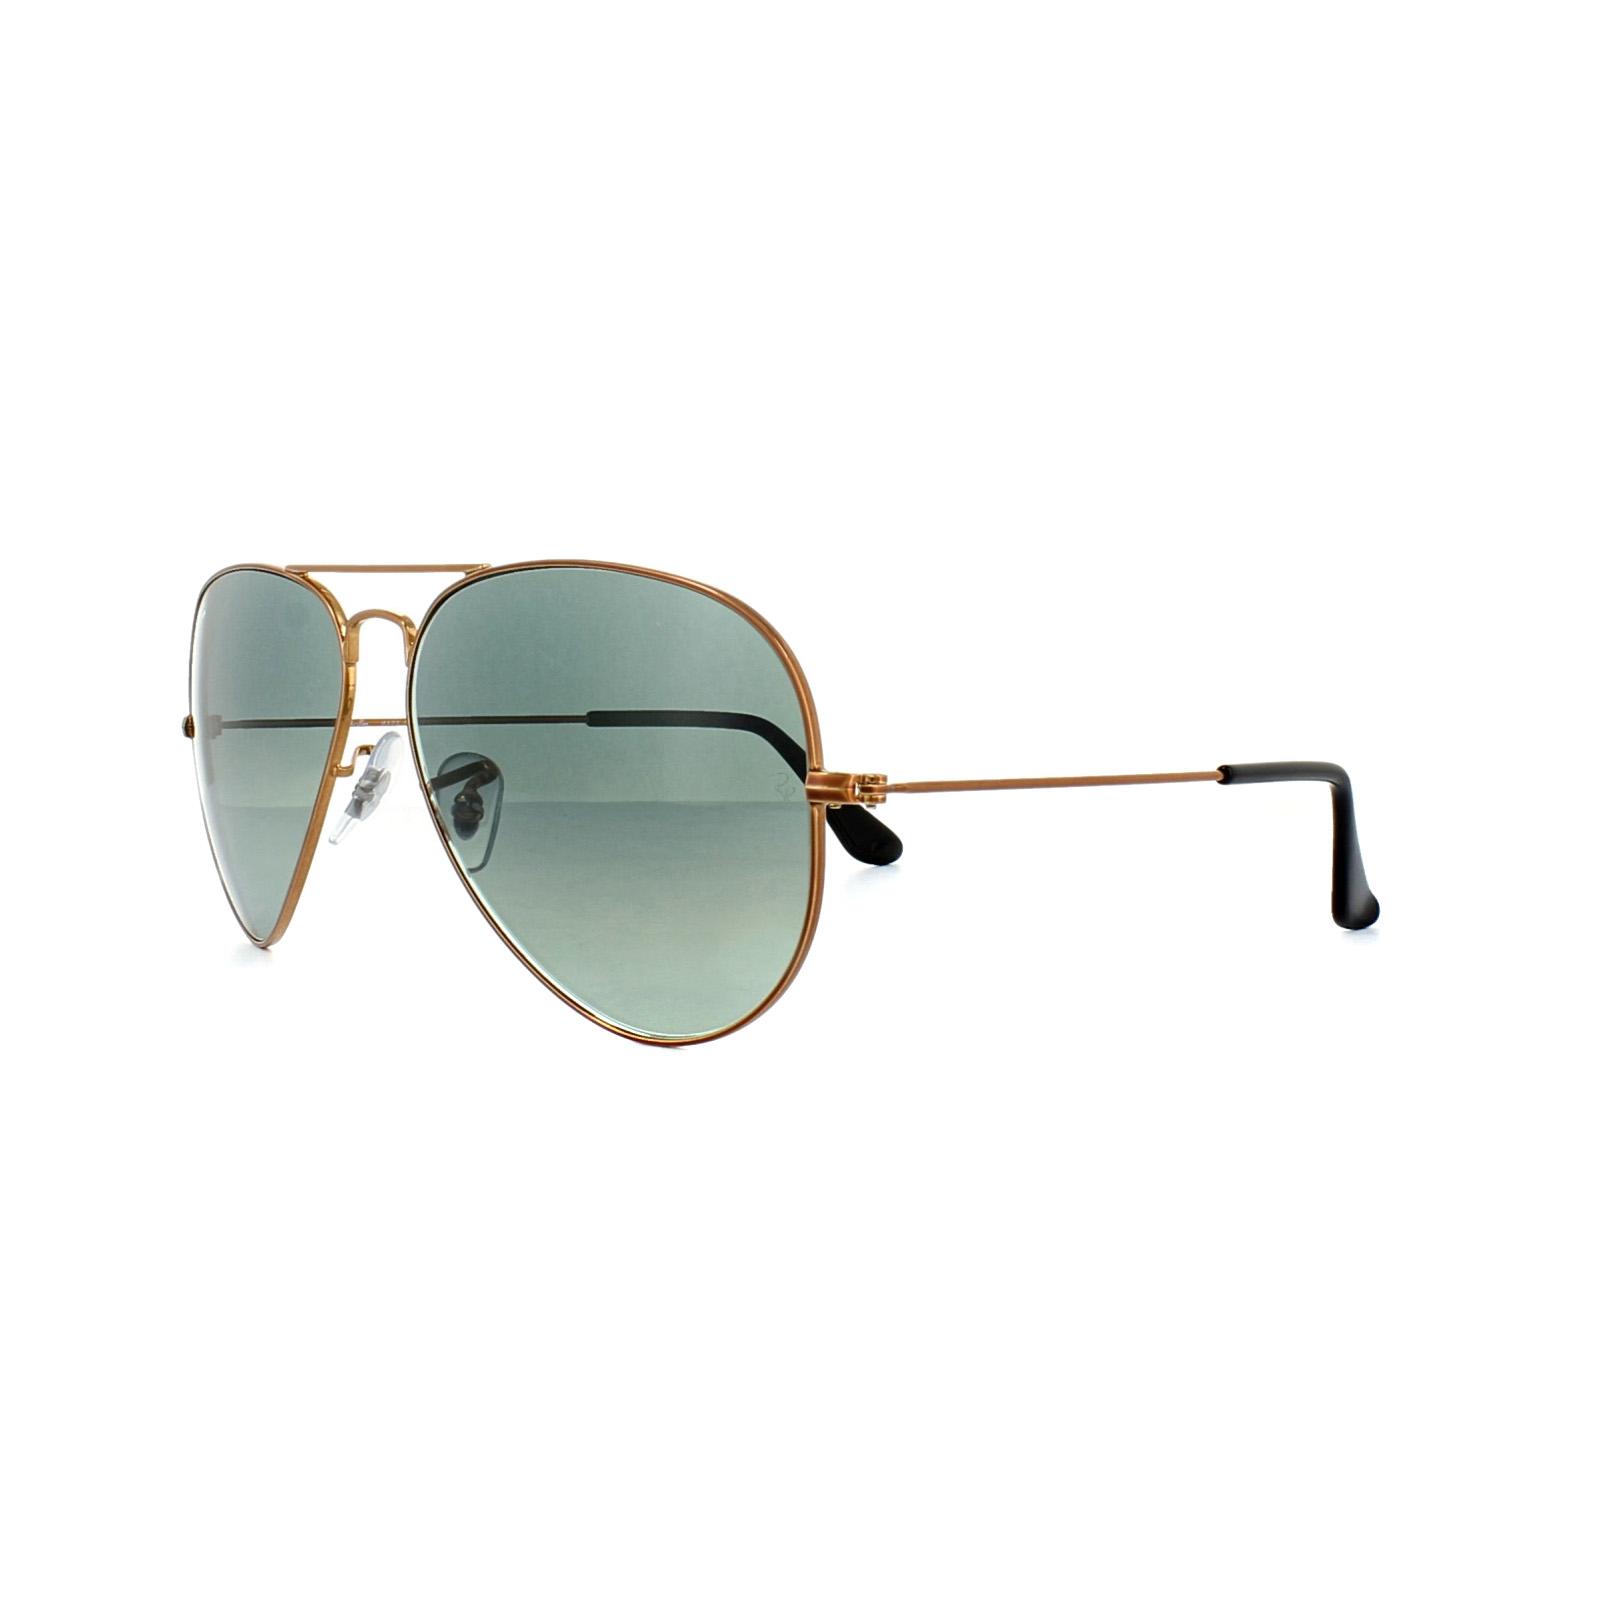 d6dd790656c08 Sentinel Ray-Ban Sunglasses Aviator 3025 197 71 Bronze Copper Grey Gradient  Medium 58mm